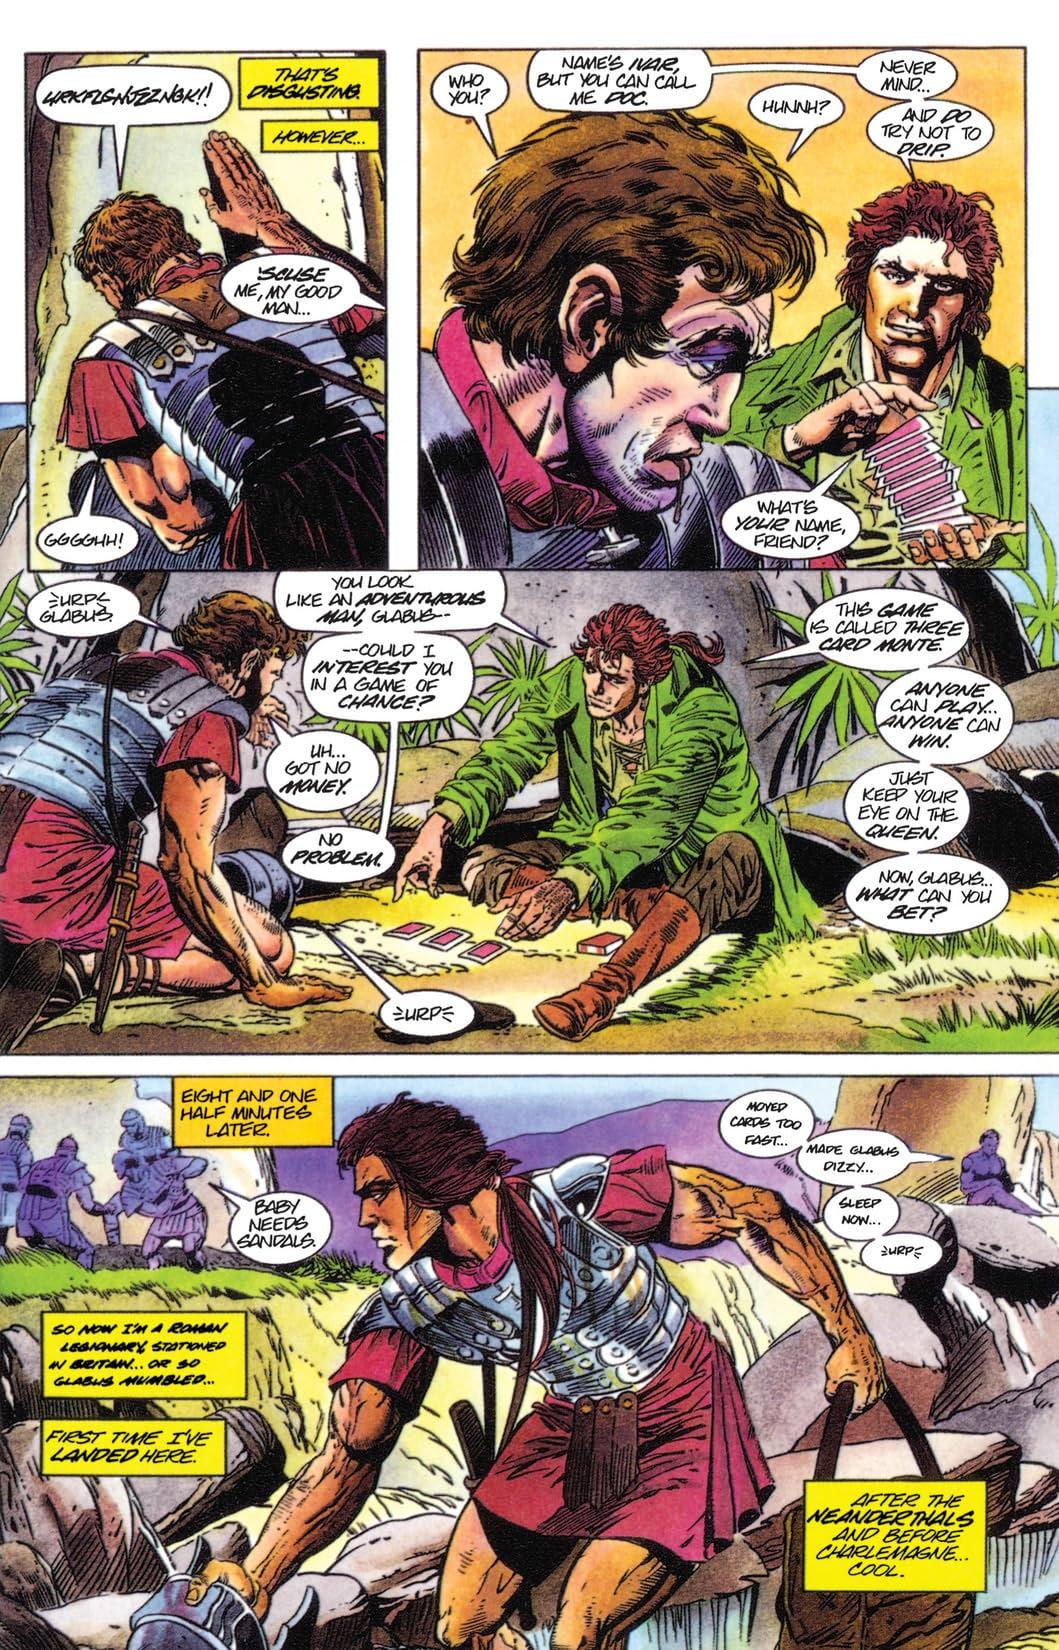 Timewalker (1994) #1